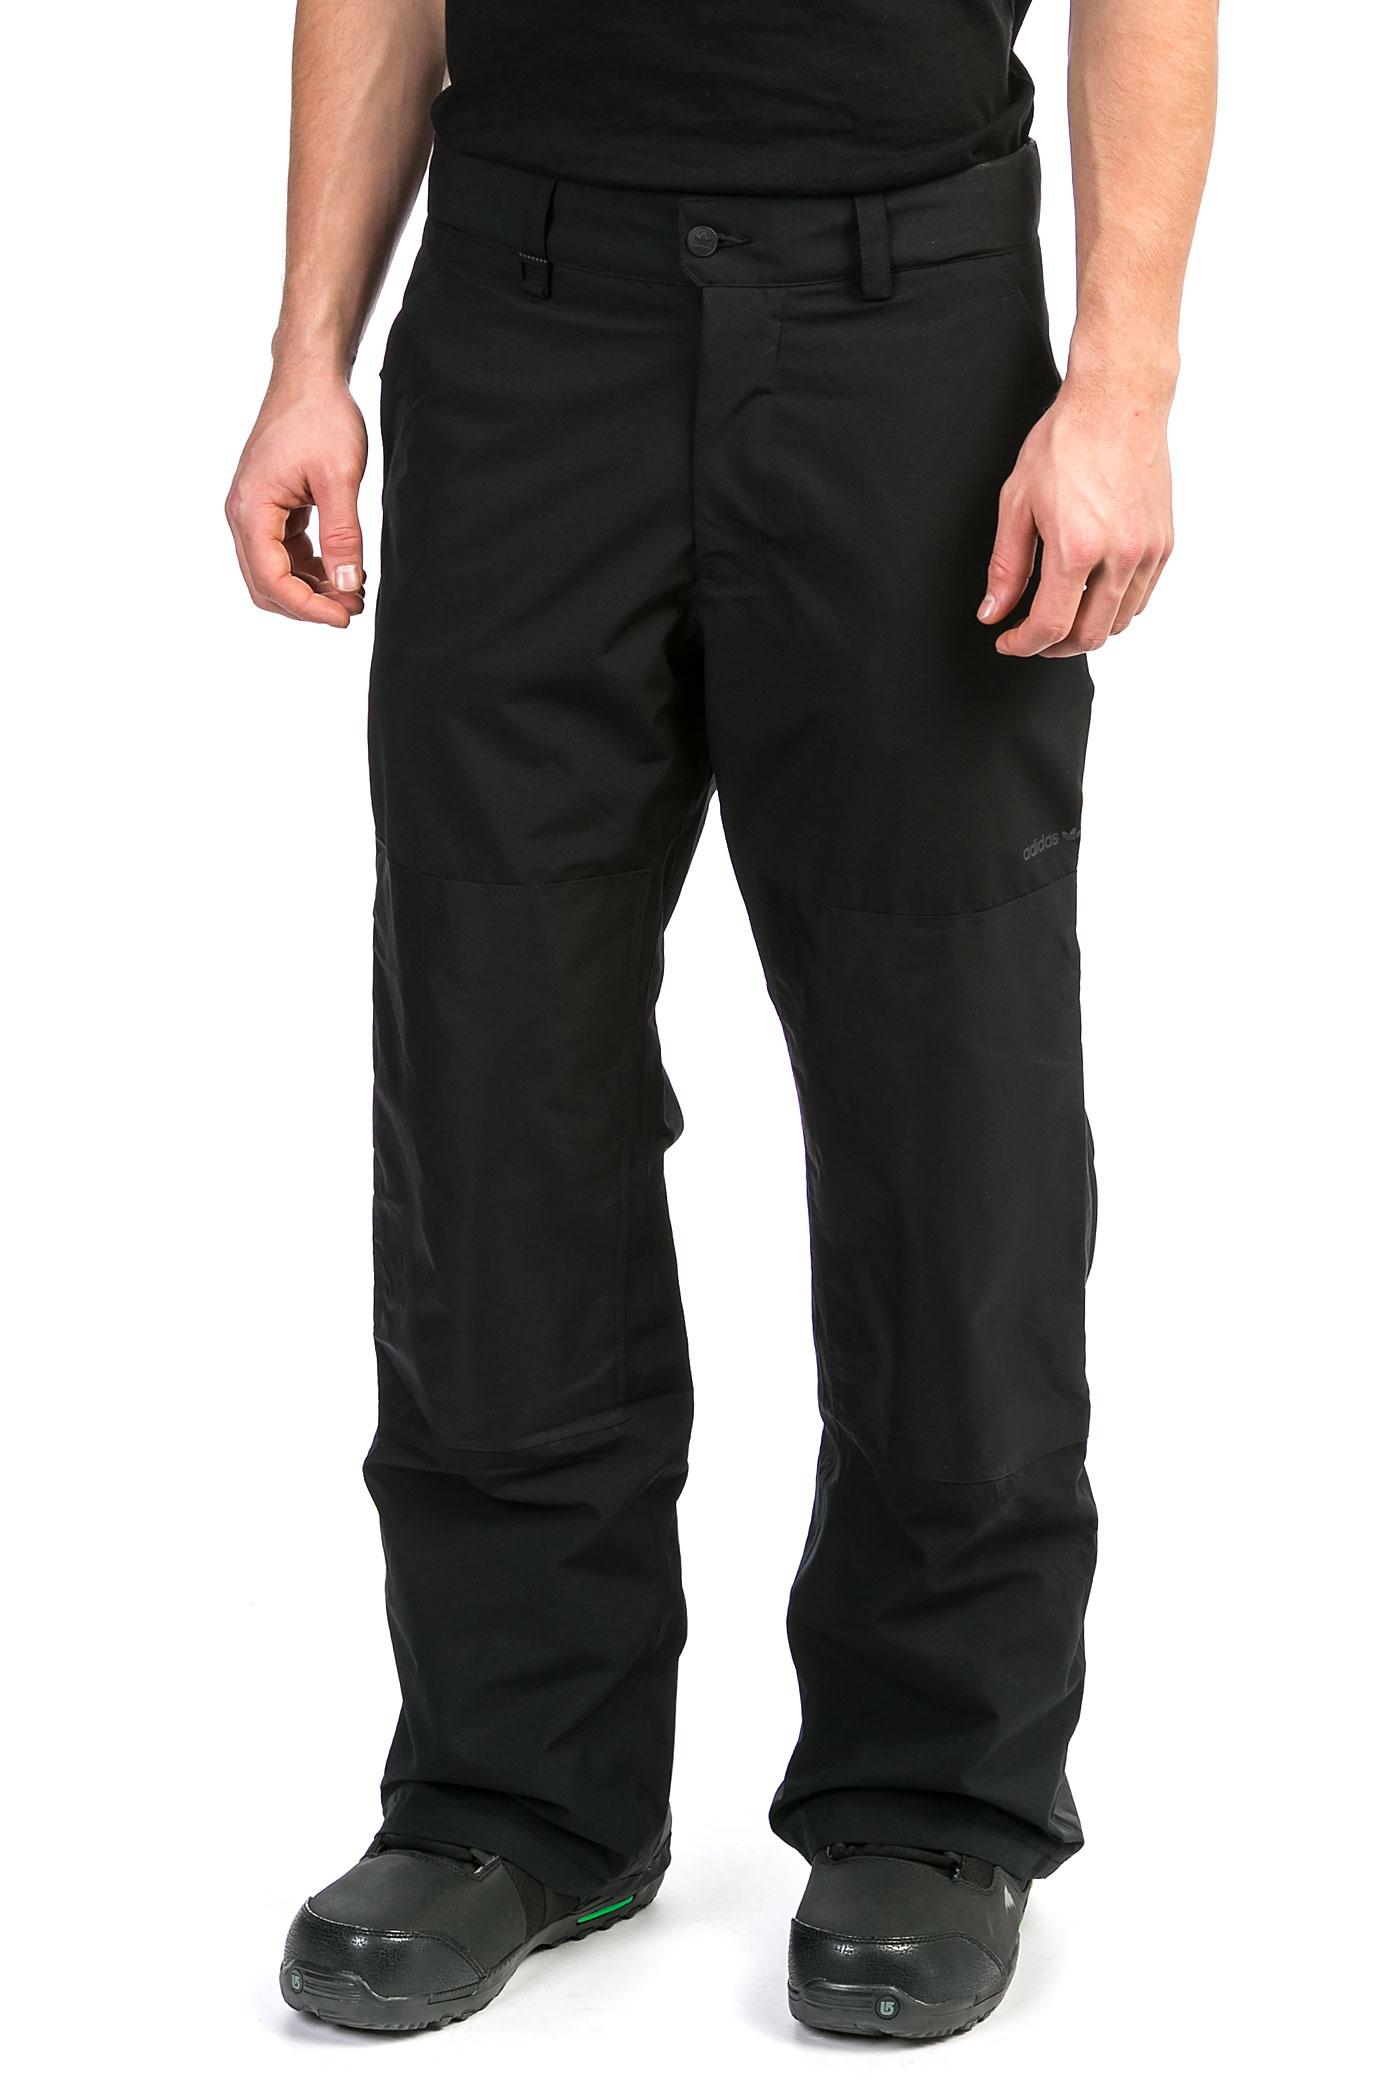 adidas pantaloni snowboard